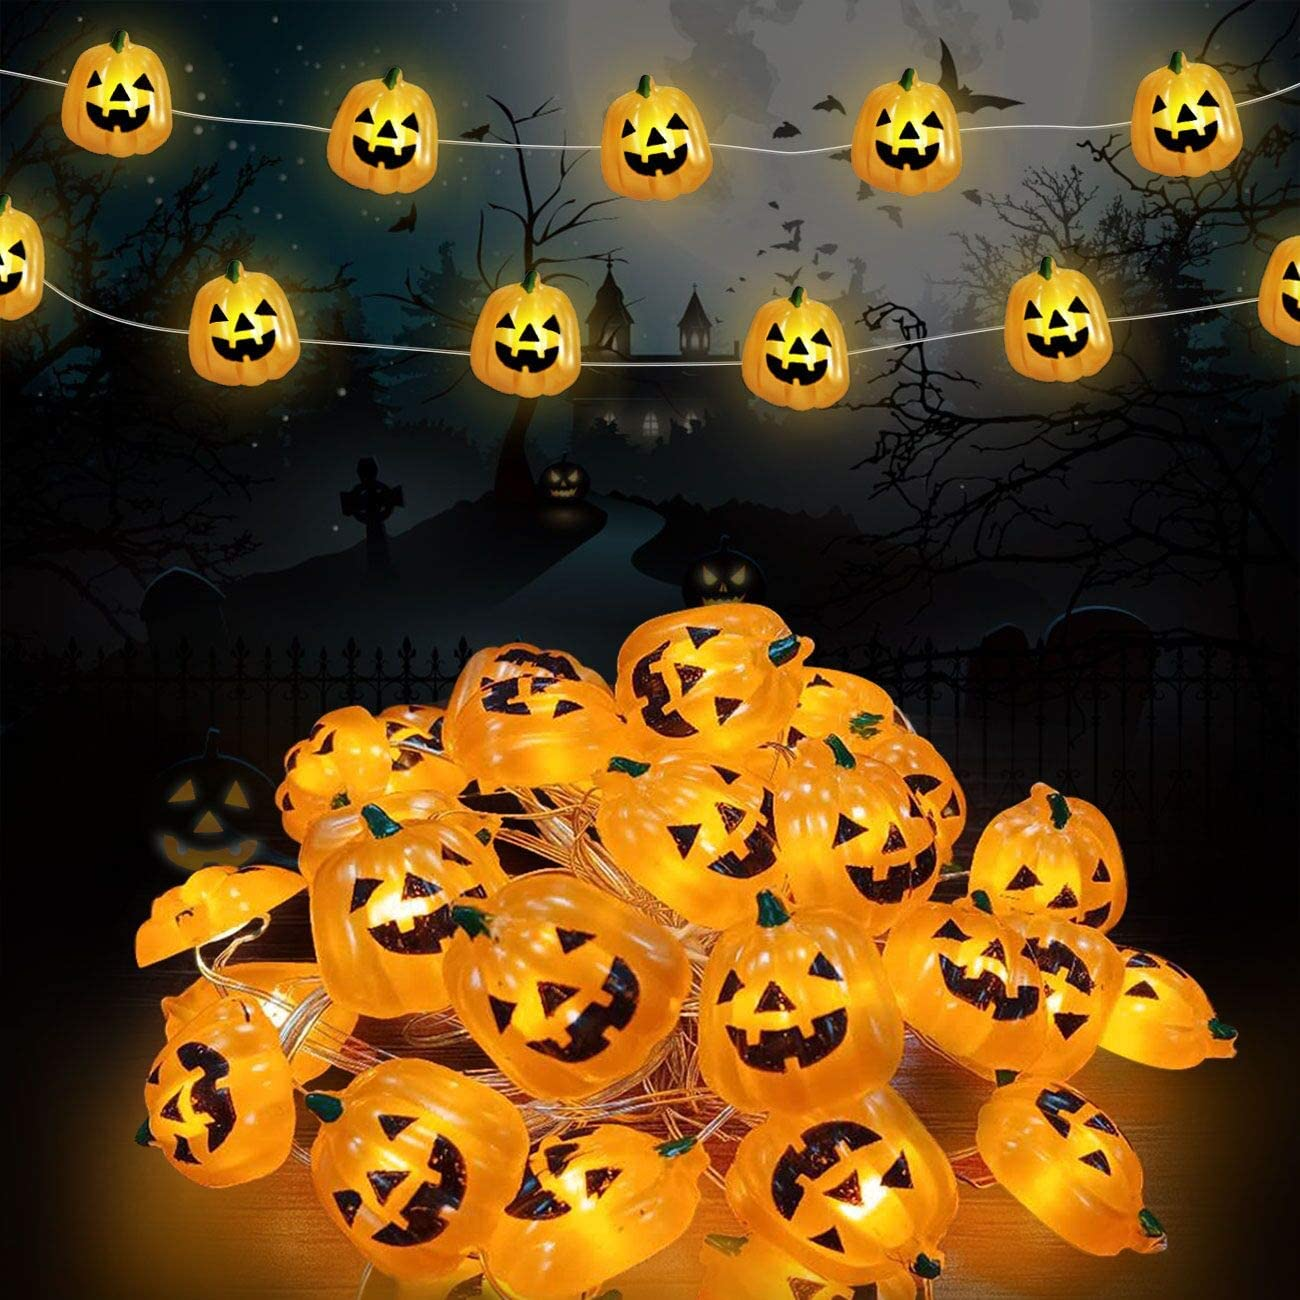 KRABICE Halloween String Lights, Pumpkin String Lights with 30 LED Pumpkin Lights, Battery Operated Halloween Decoration Lights, for Indoor Outdoor Patio, Garden, Gate, Yard